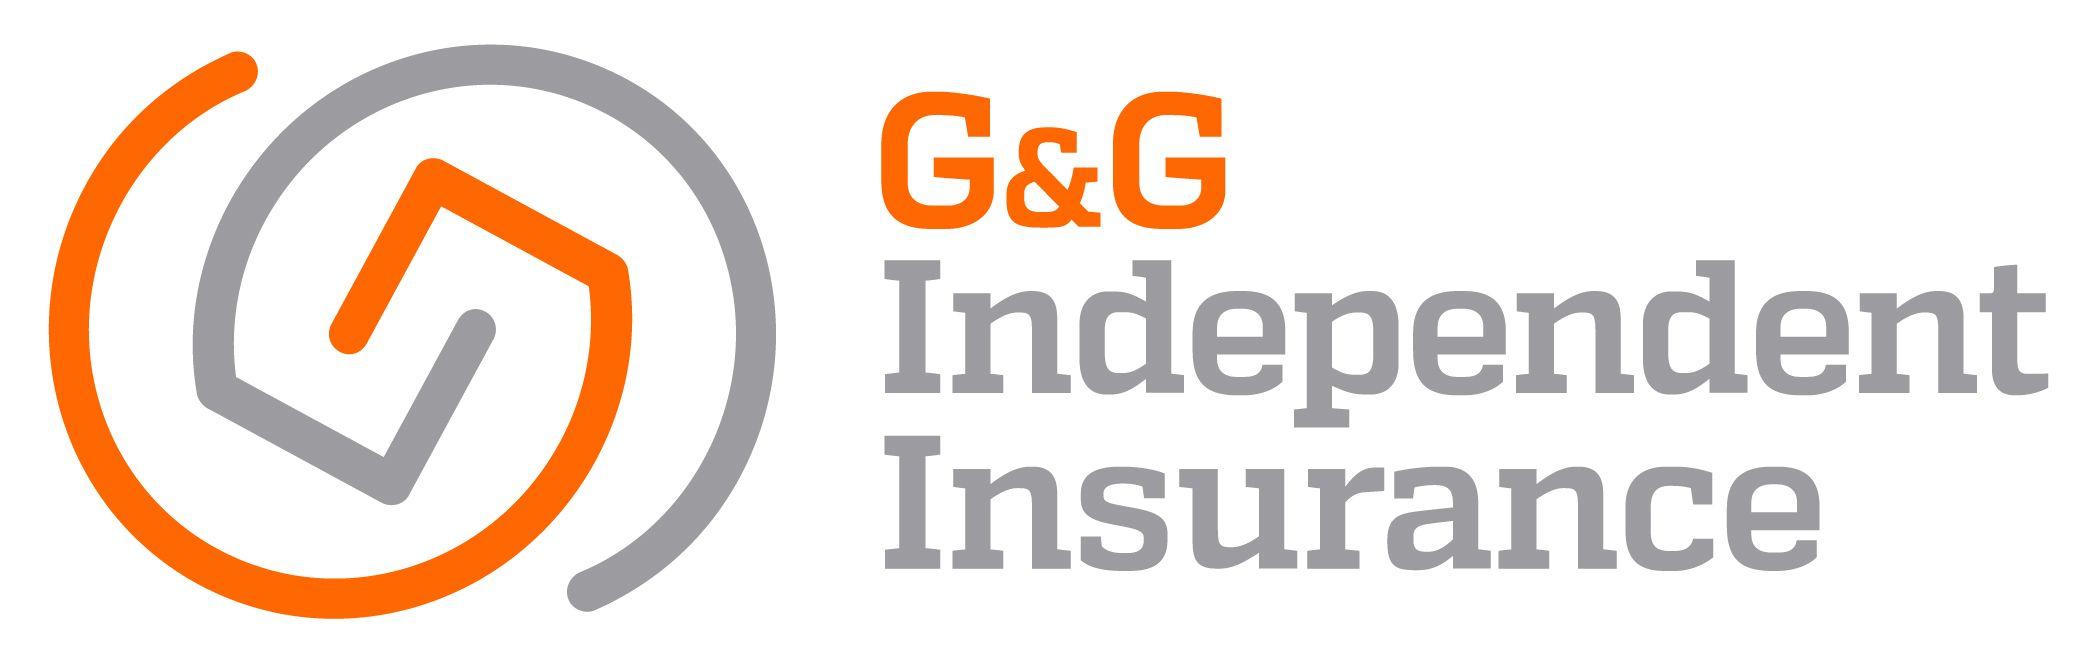 G&G Independent Insurance Logo